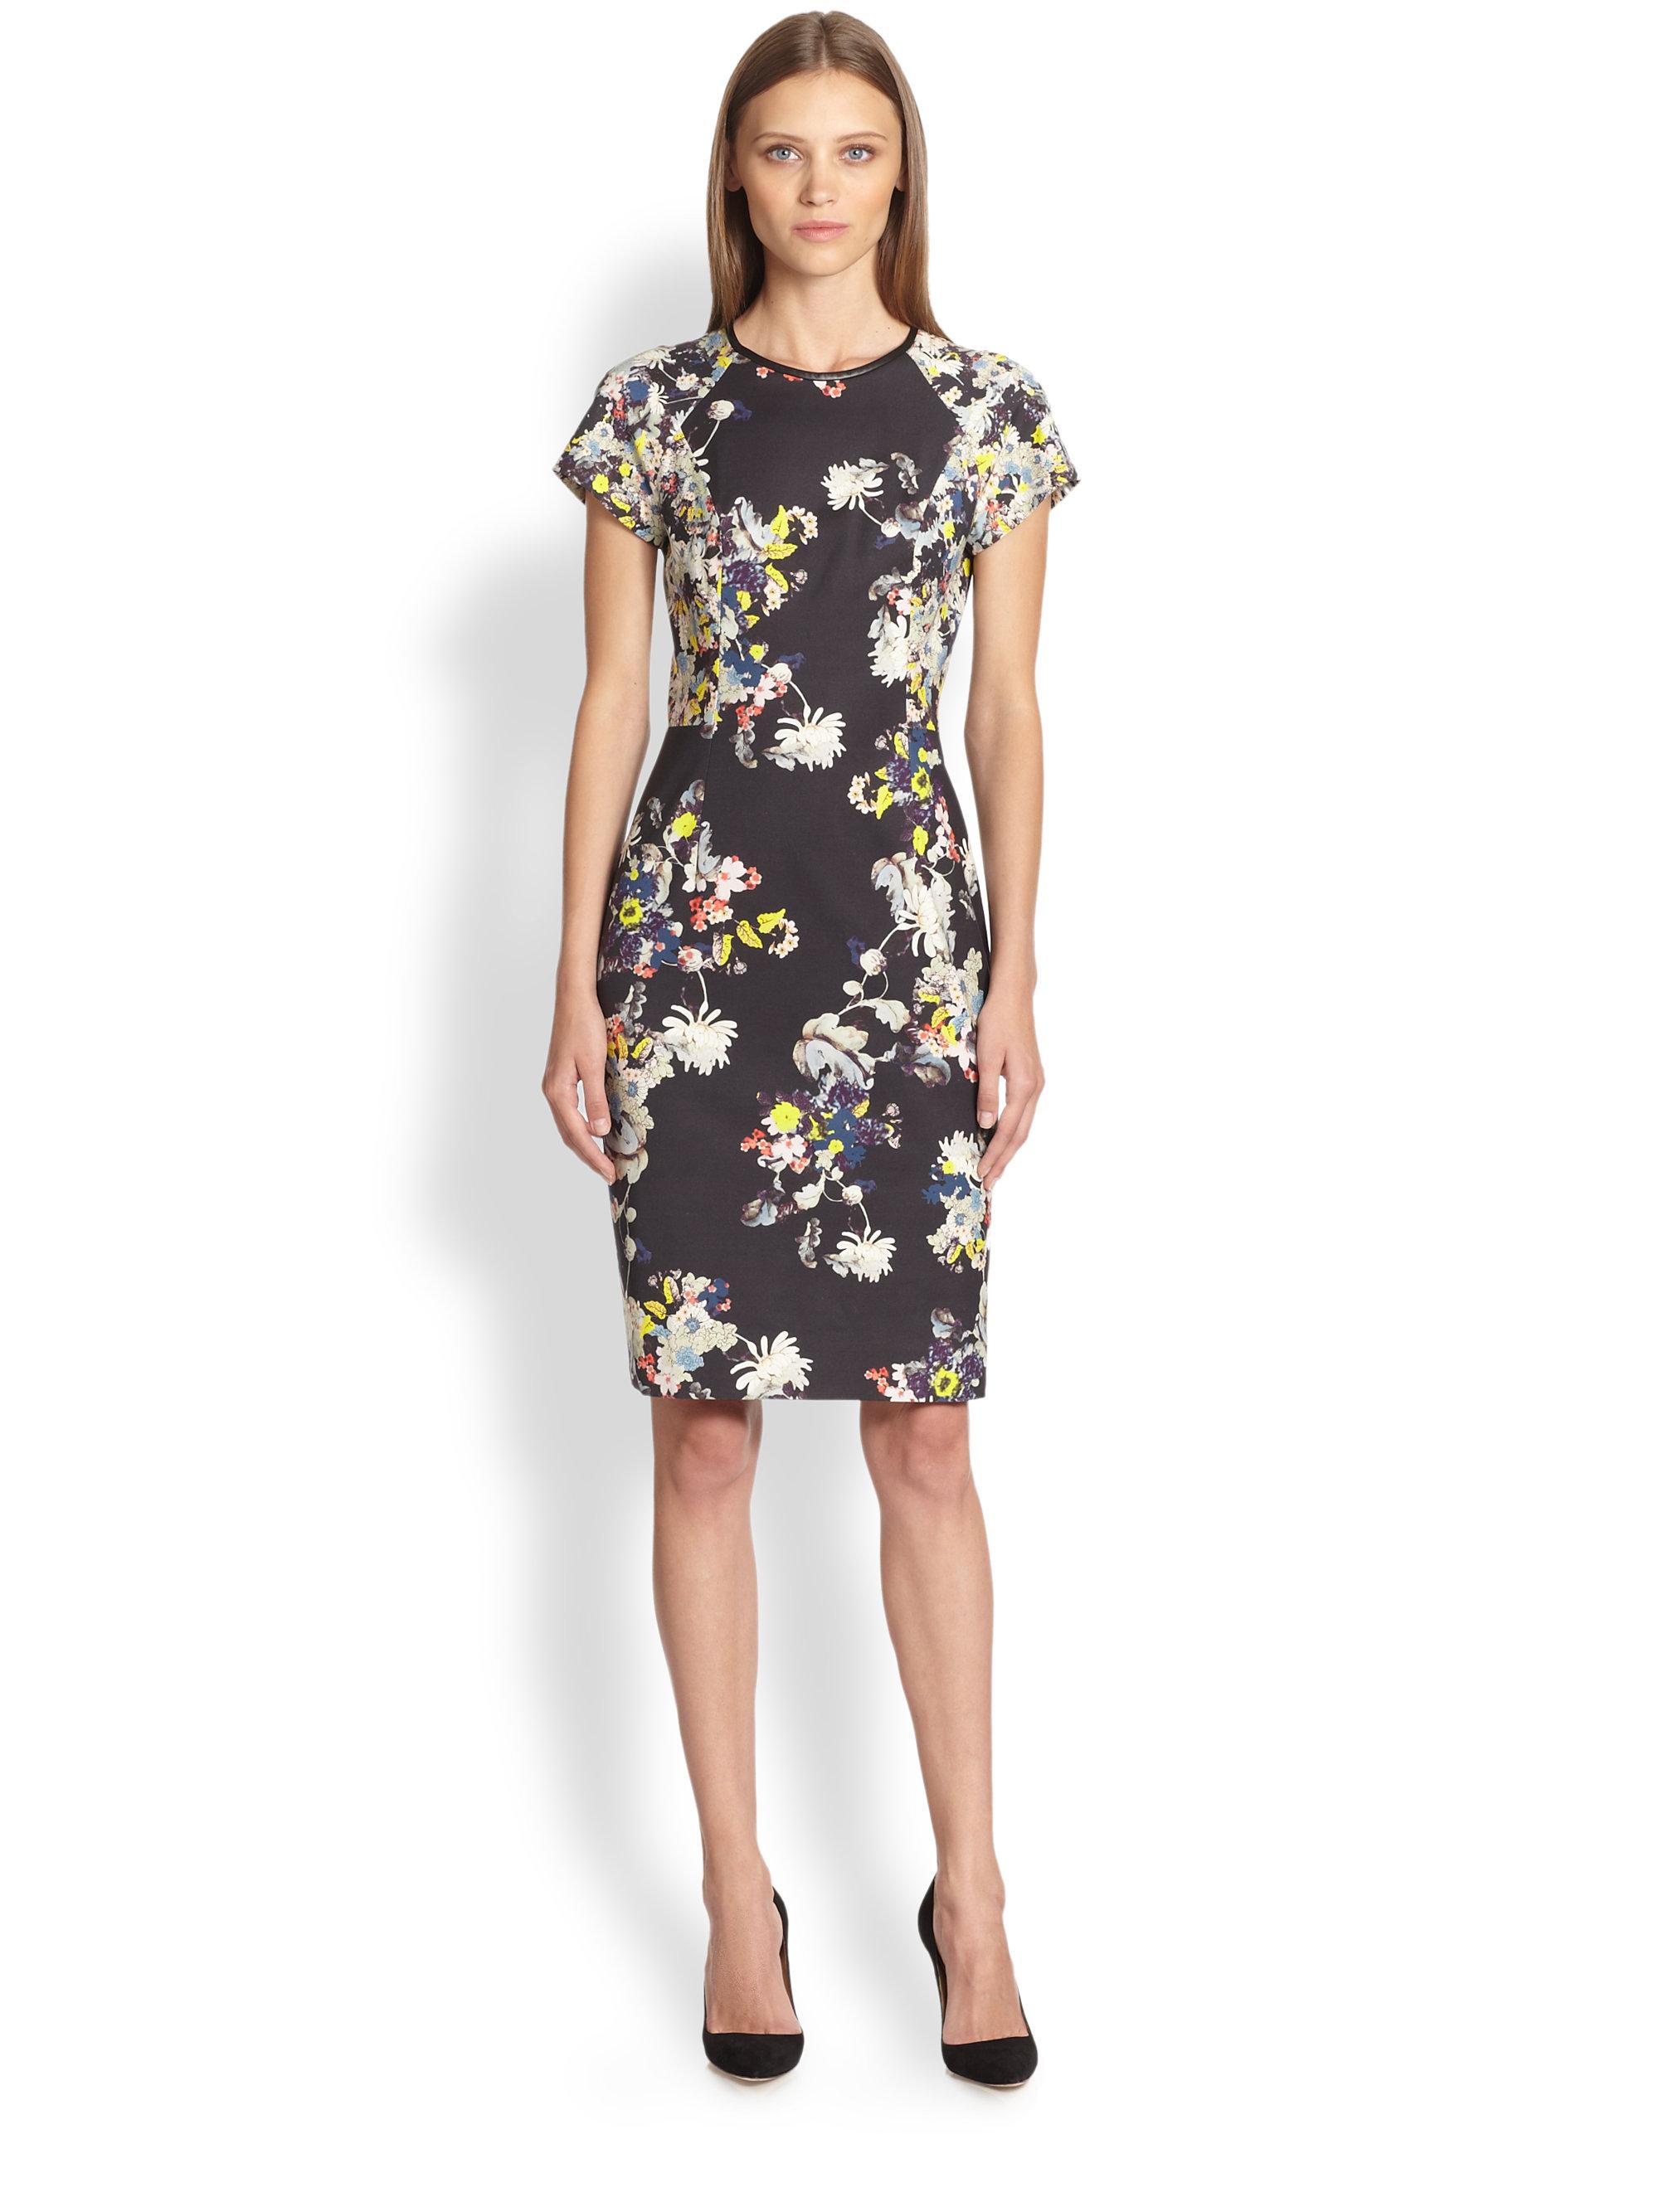 Cool Erdem Dress Style | Marvellous Erdem Clothing